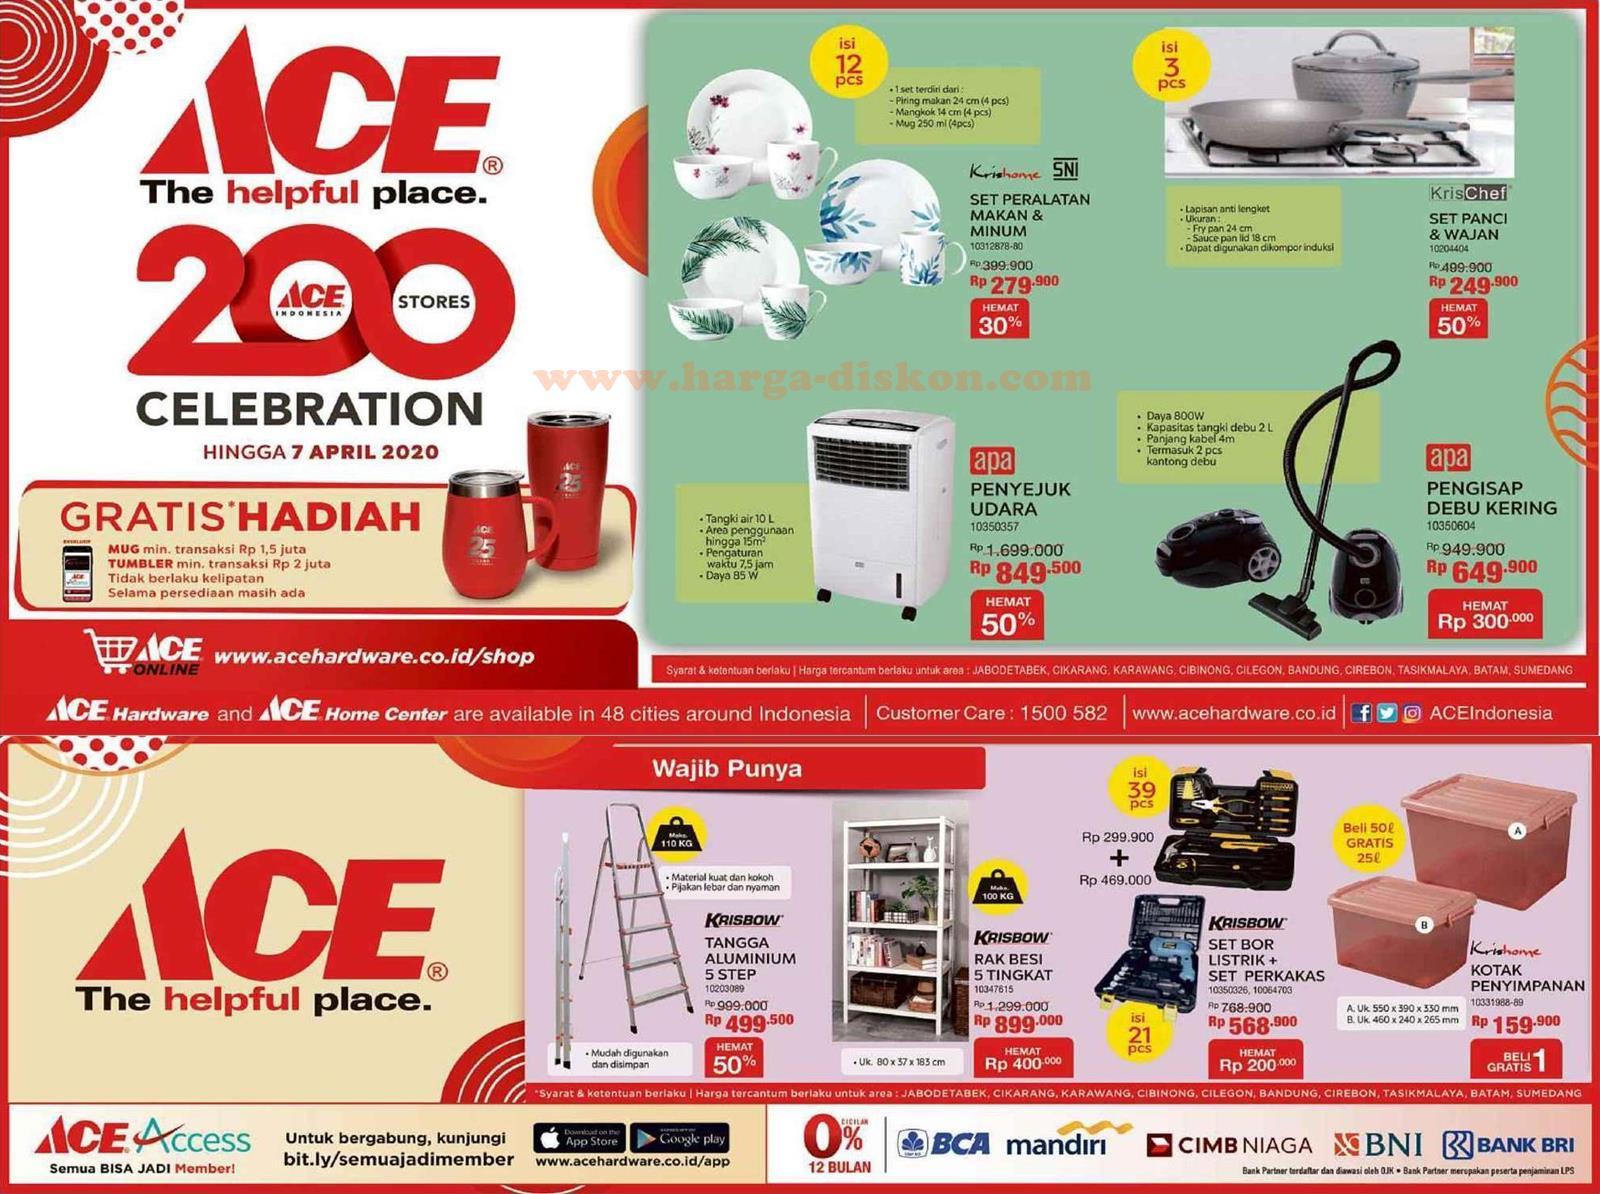 Promo Ace Hardware Terbaru Ace Celebration Hingga 7 April 2020 Harga Diskon